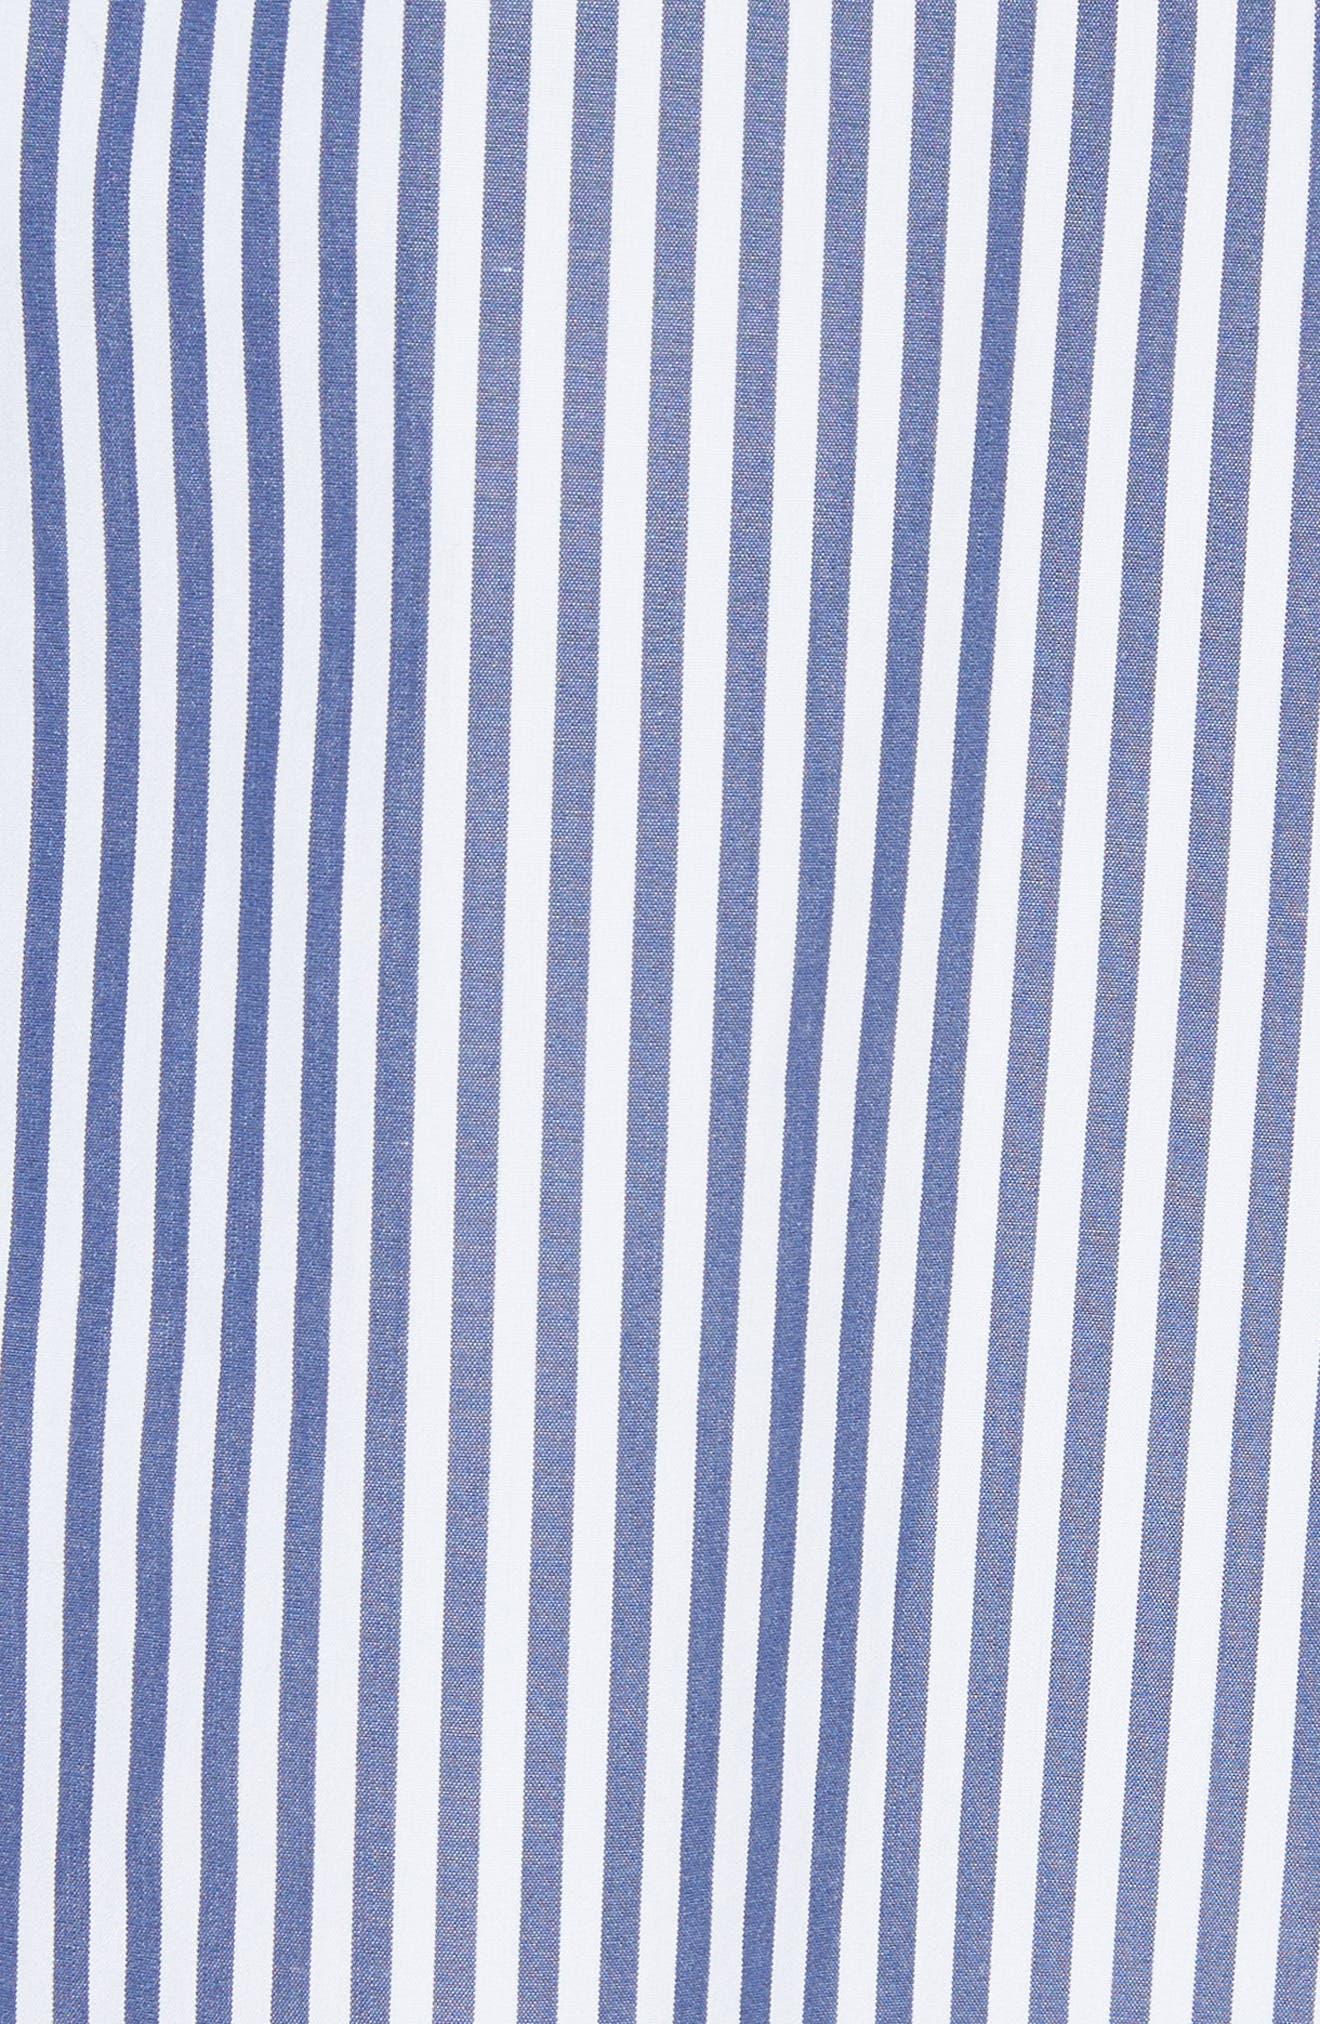 Clean Stripe Shirtdress,                             Alternate thumbnail 4, color,                             Blue/ White